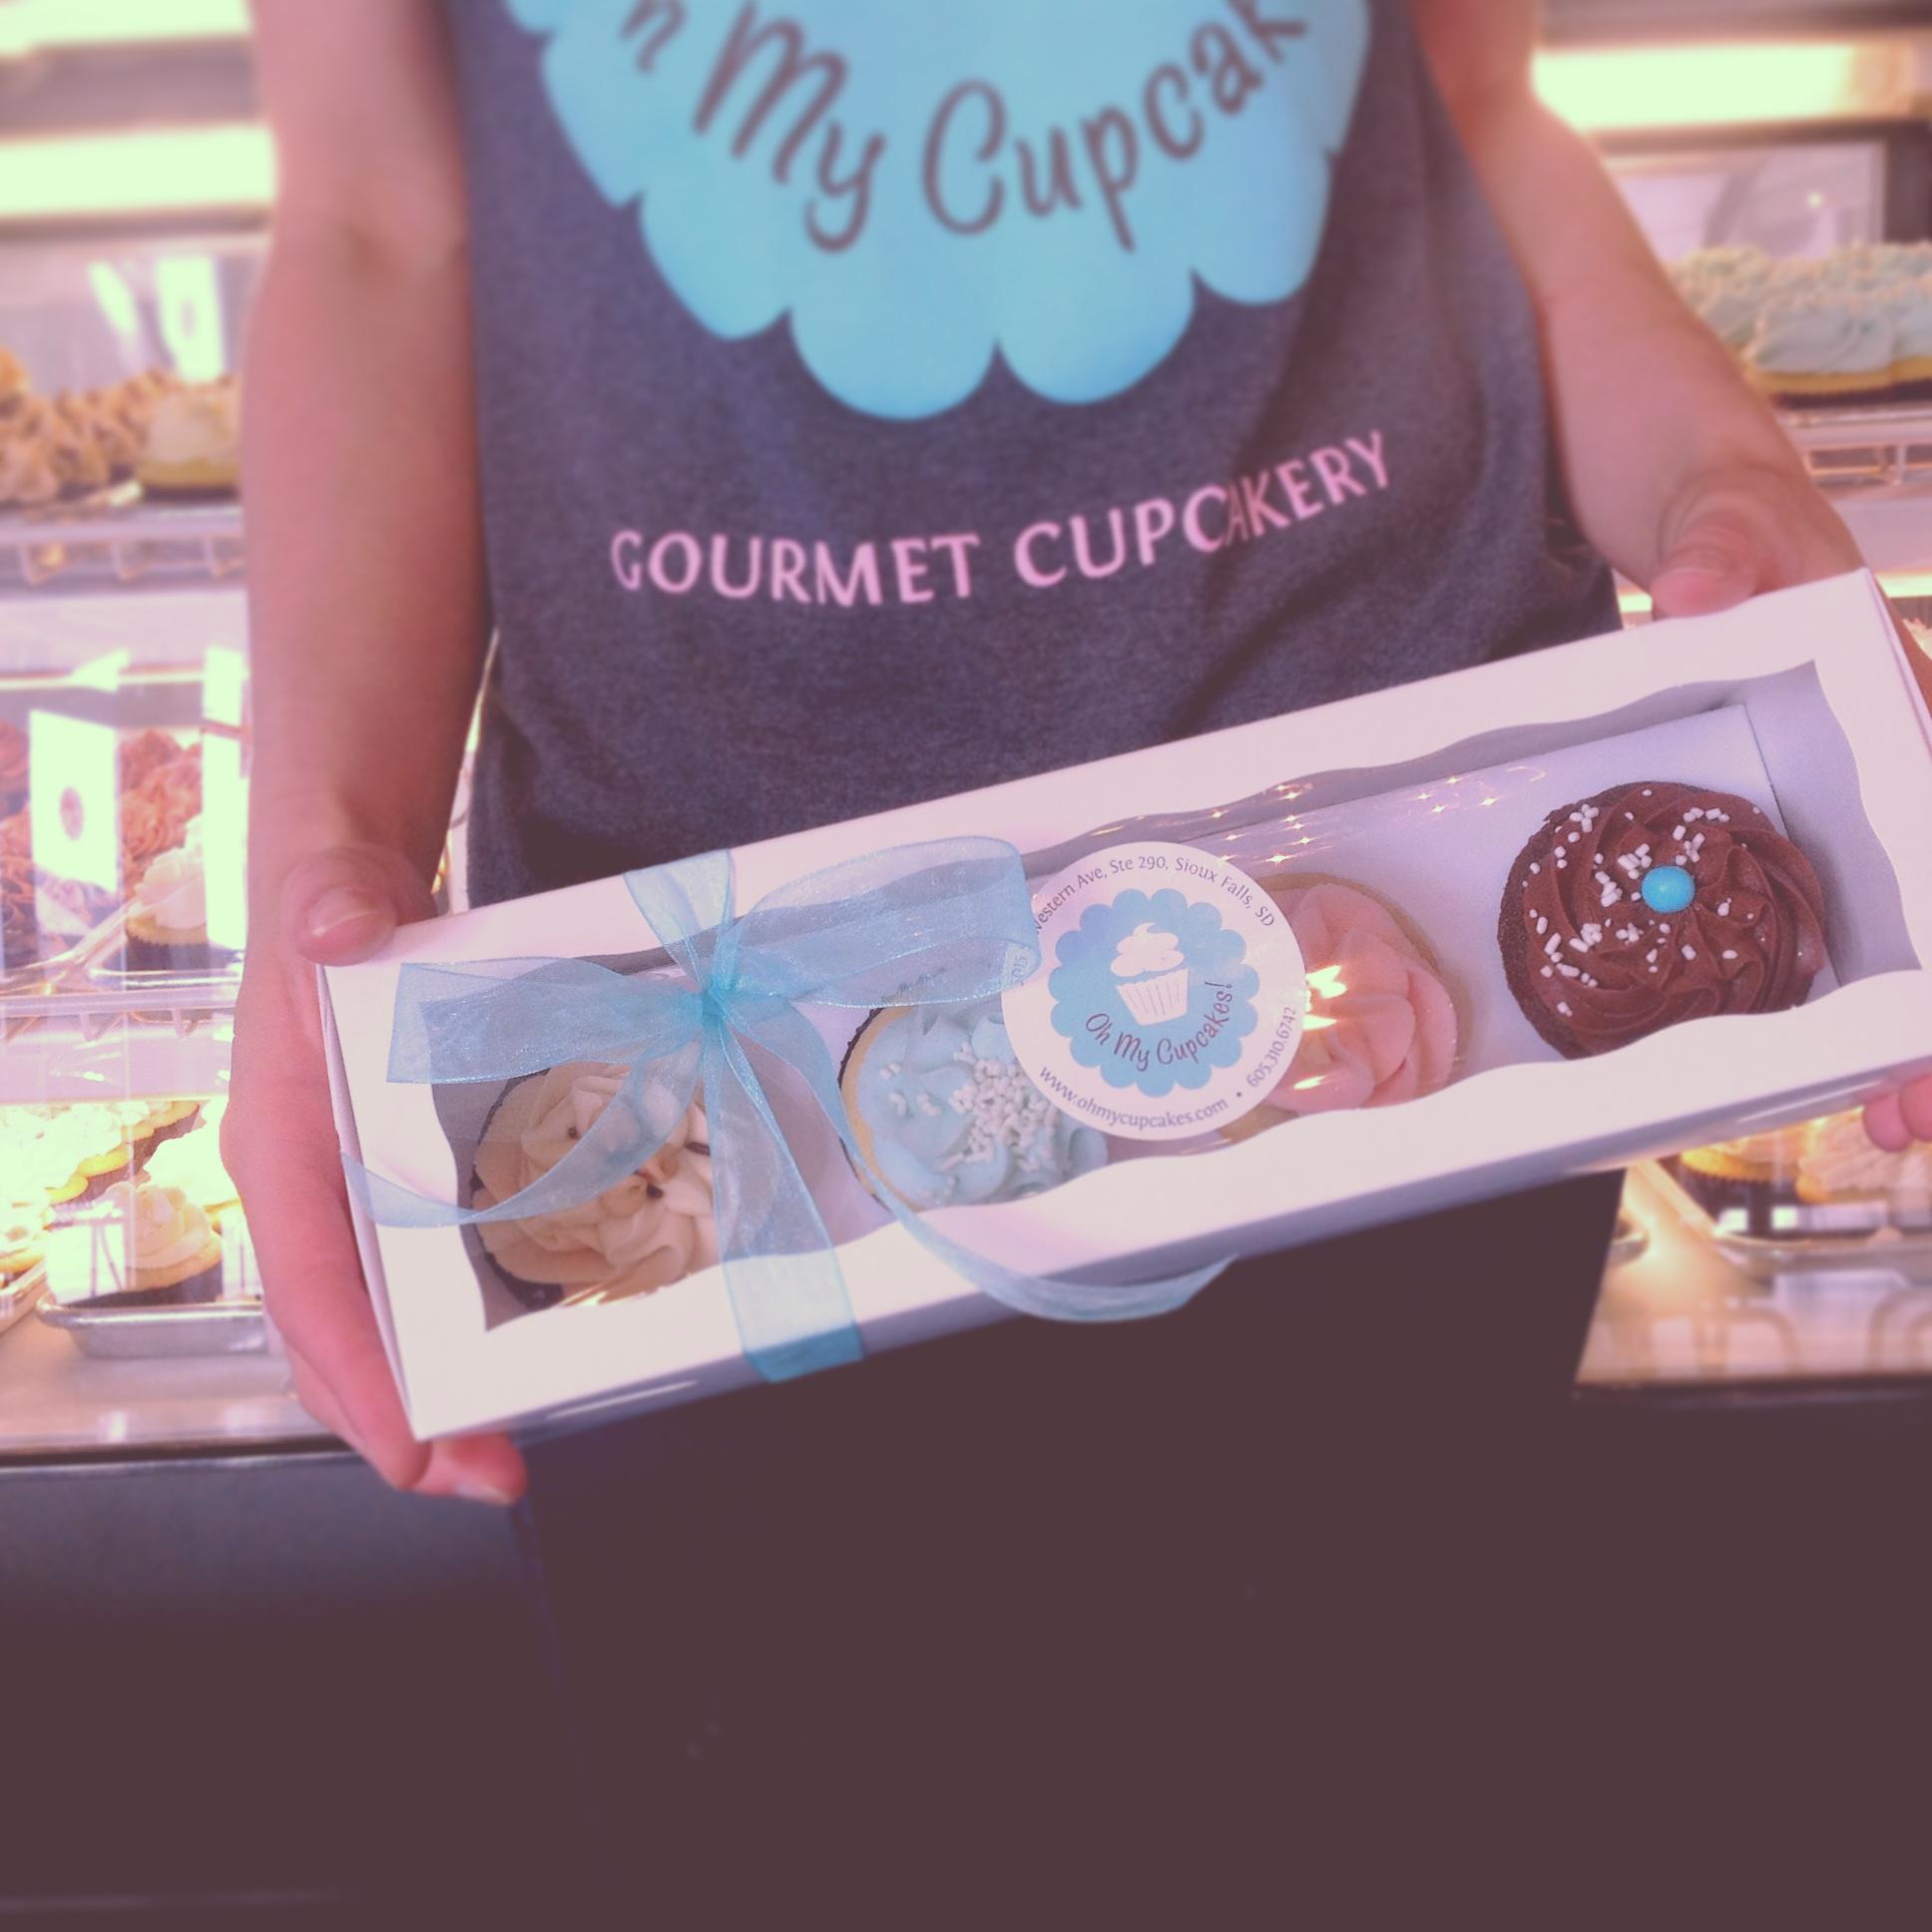 cupcake gift box.JPG